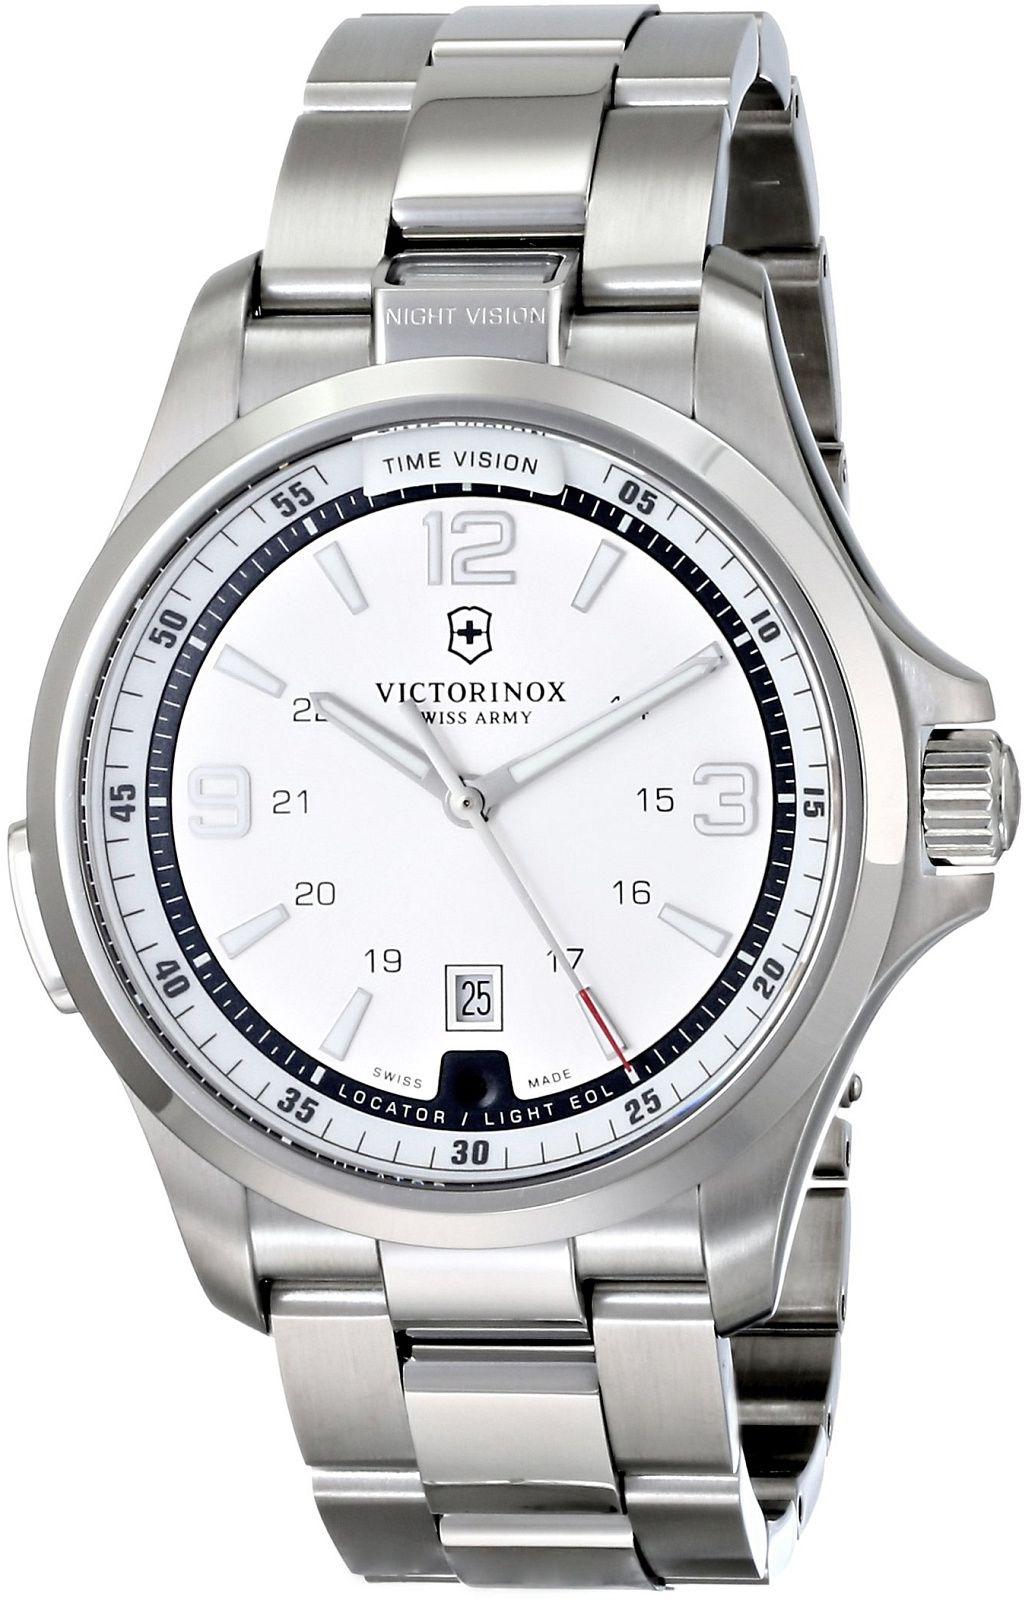 Zegarek męski Victorinox Night Vision